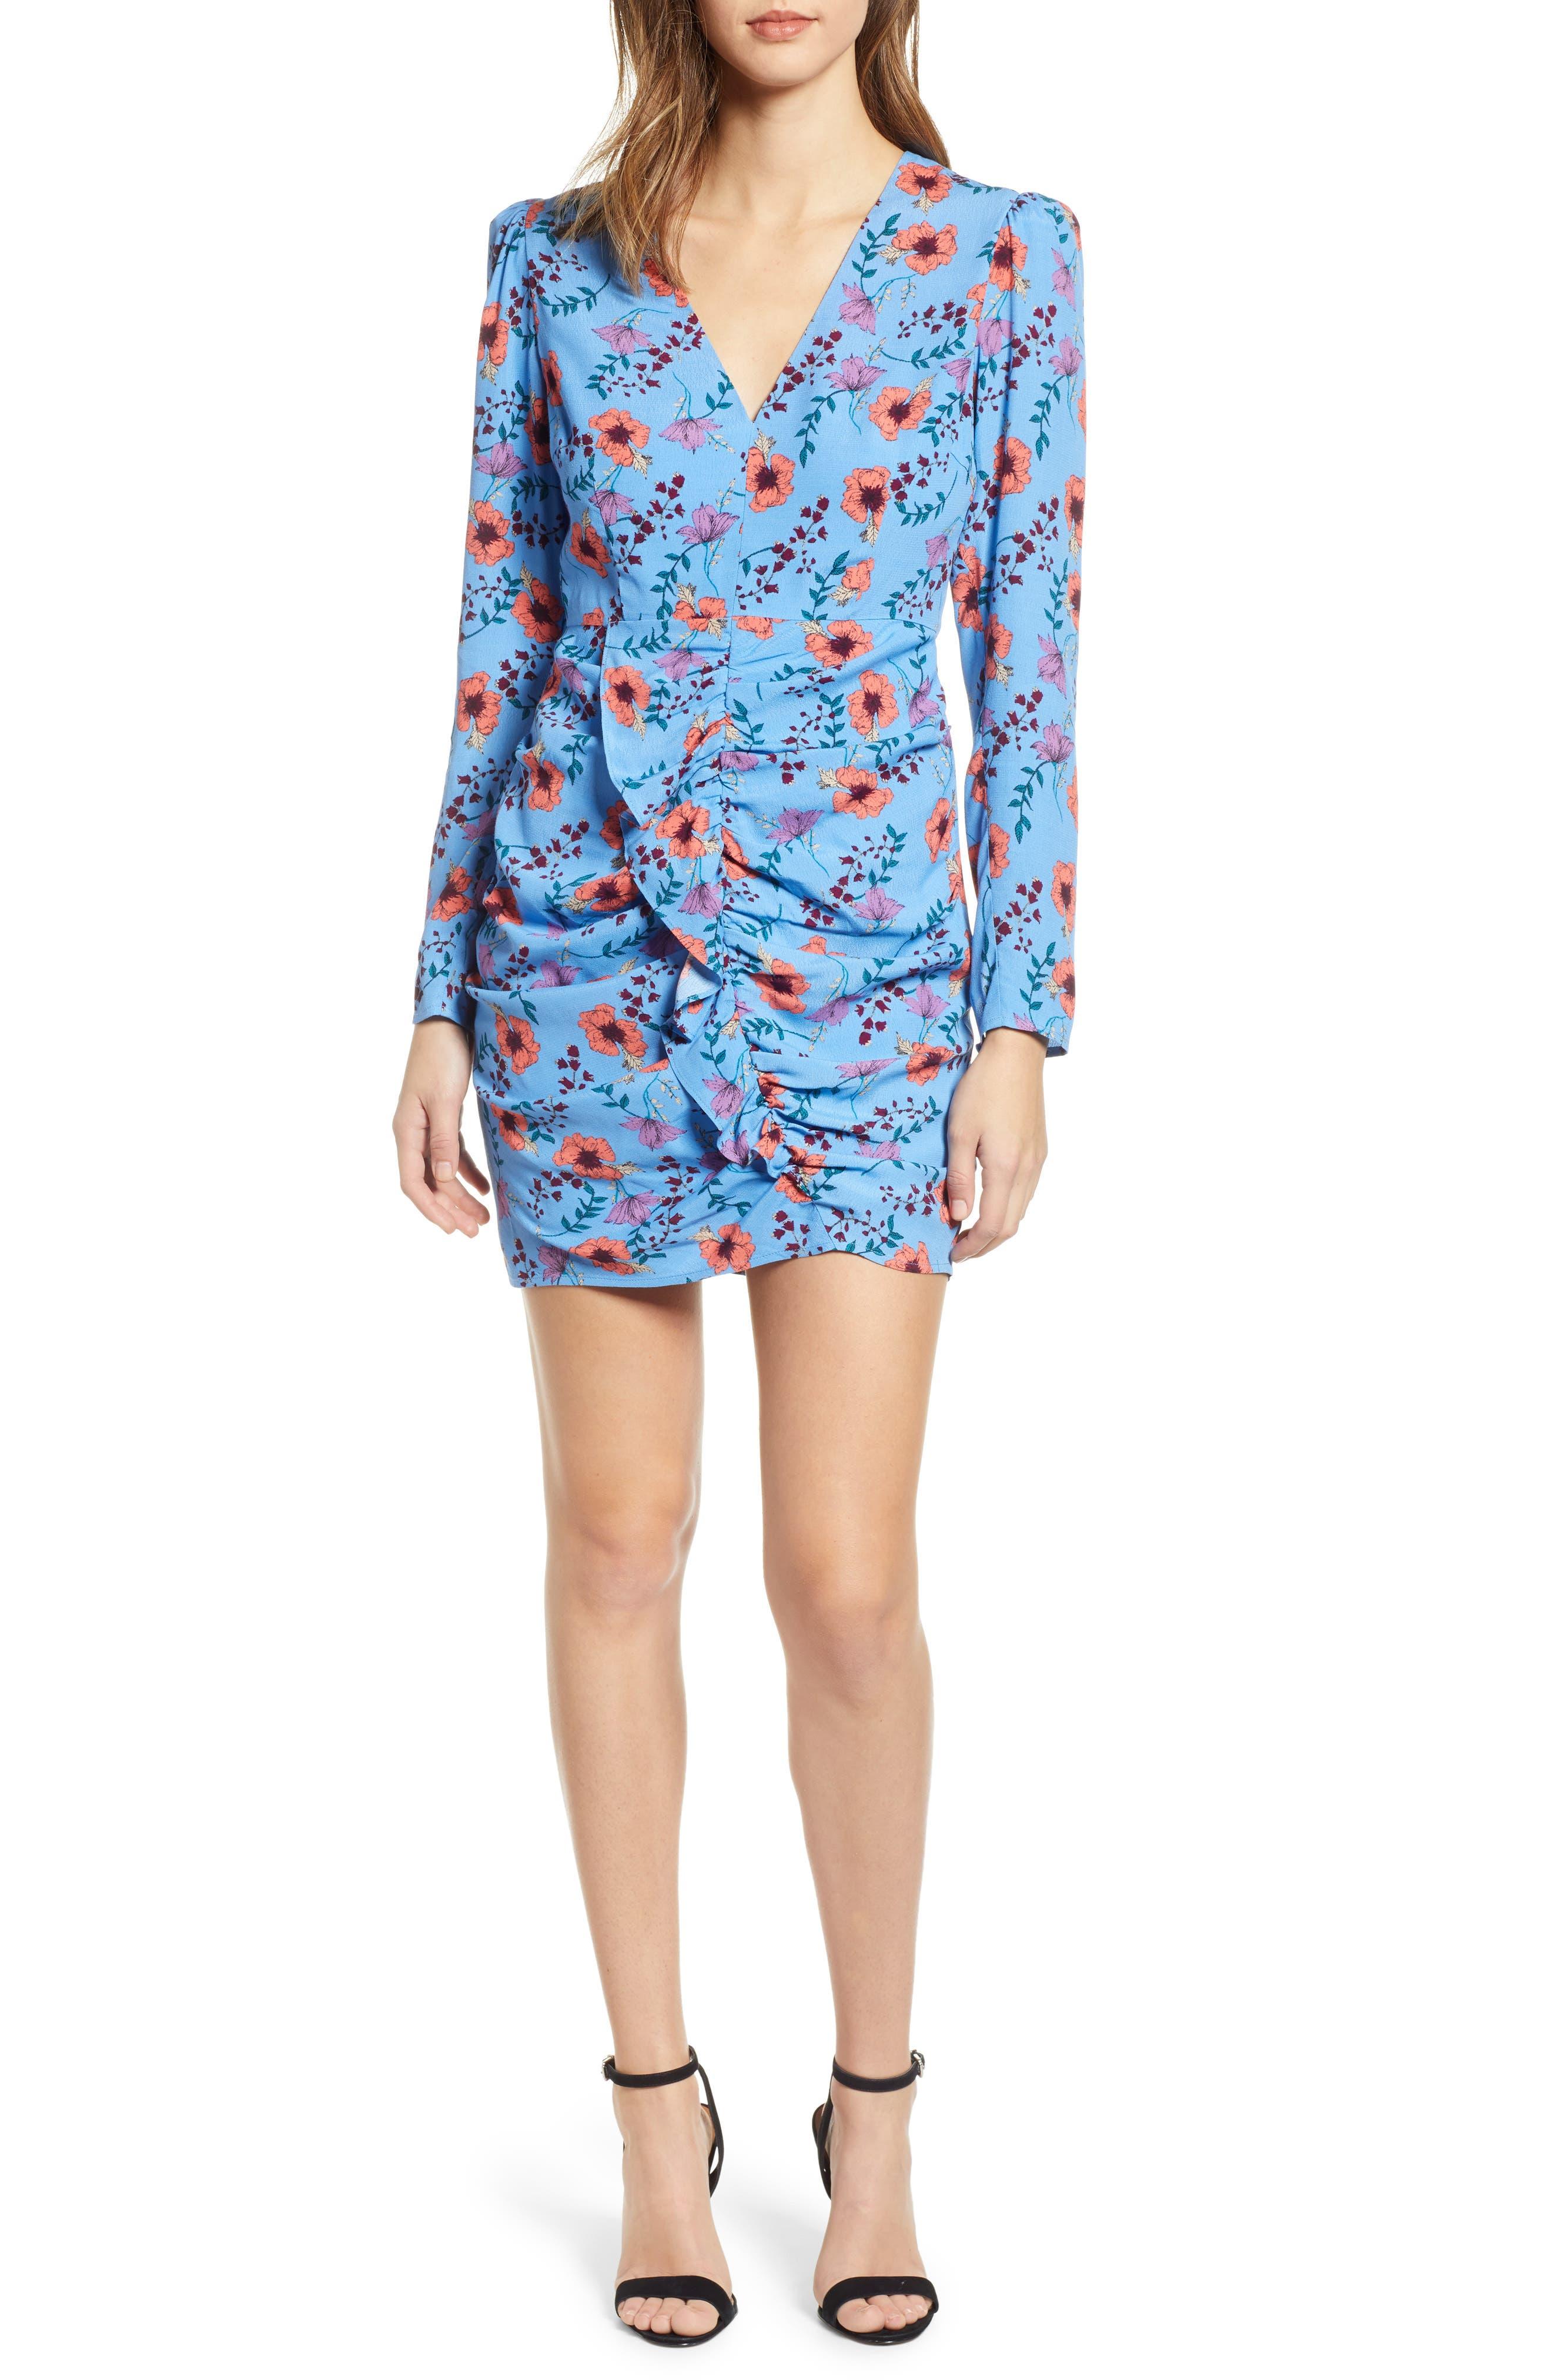 ASTR THE LABEL Floral Print Ruched Dress, Main, color, BLUE MULTI FLORAL